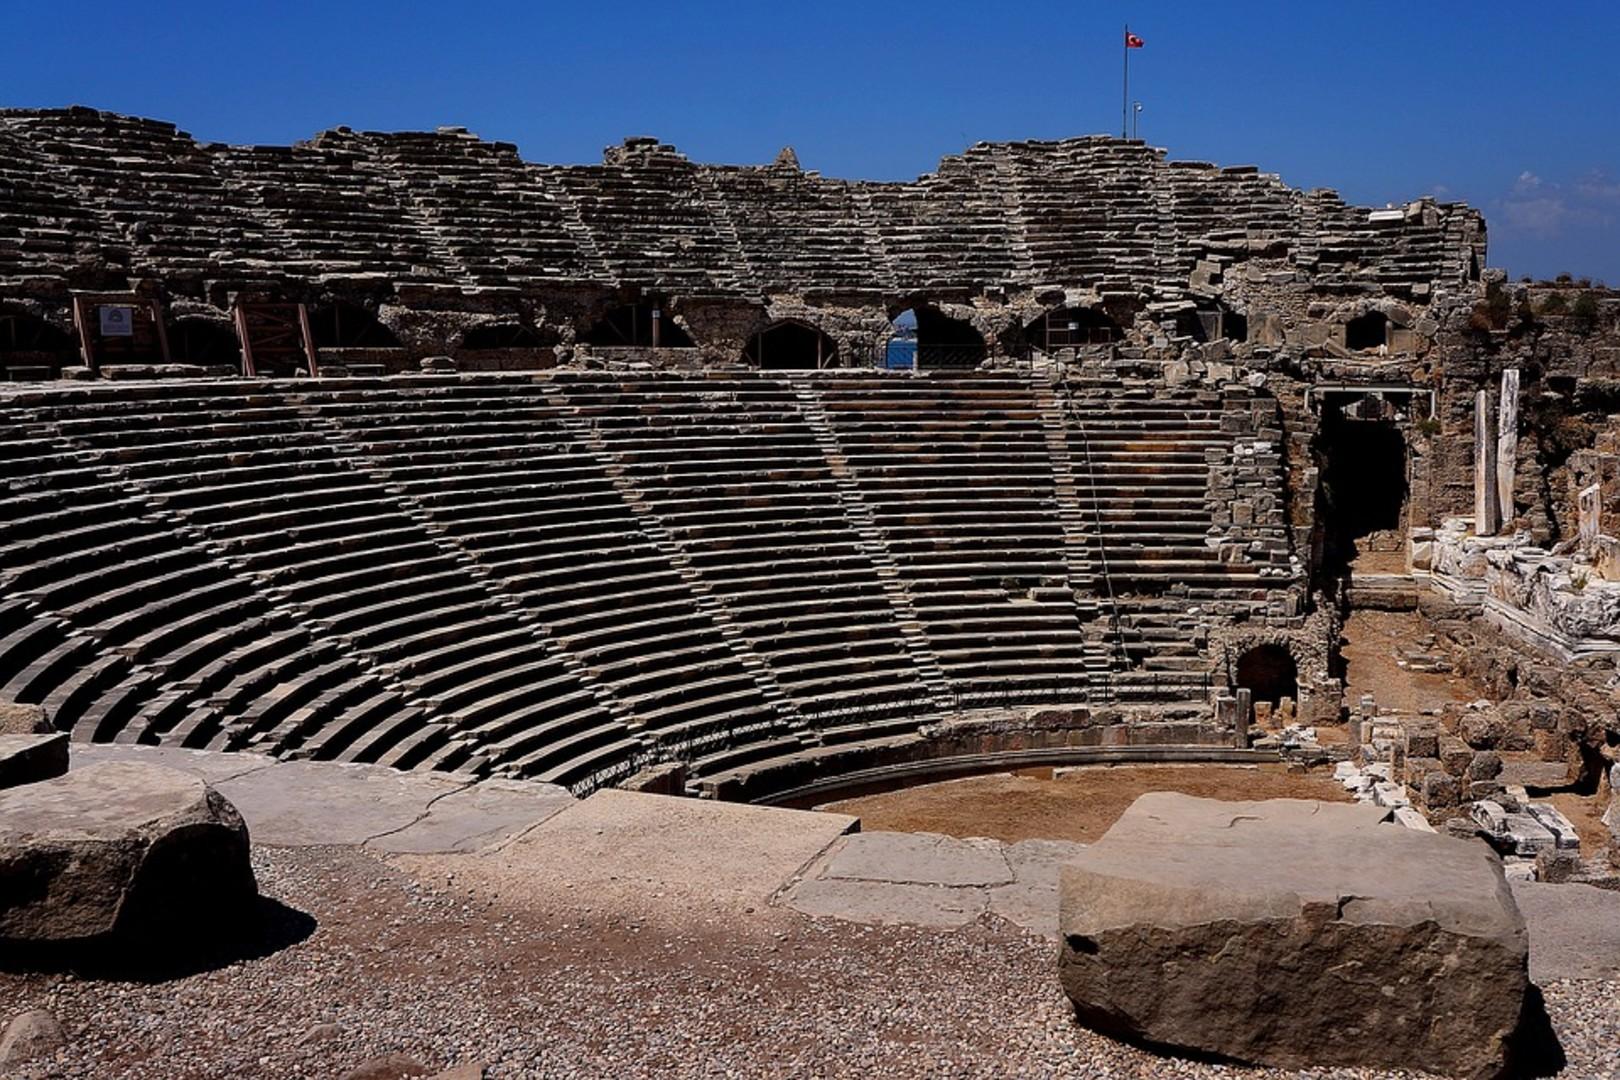 amphitheater-1833892_960_720.jpg